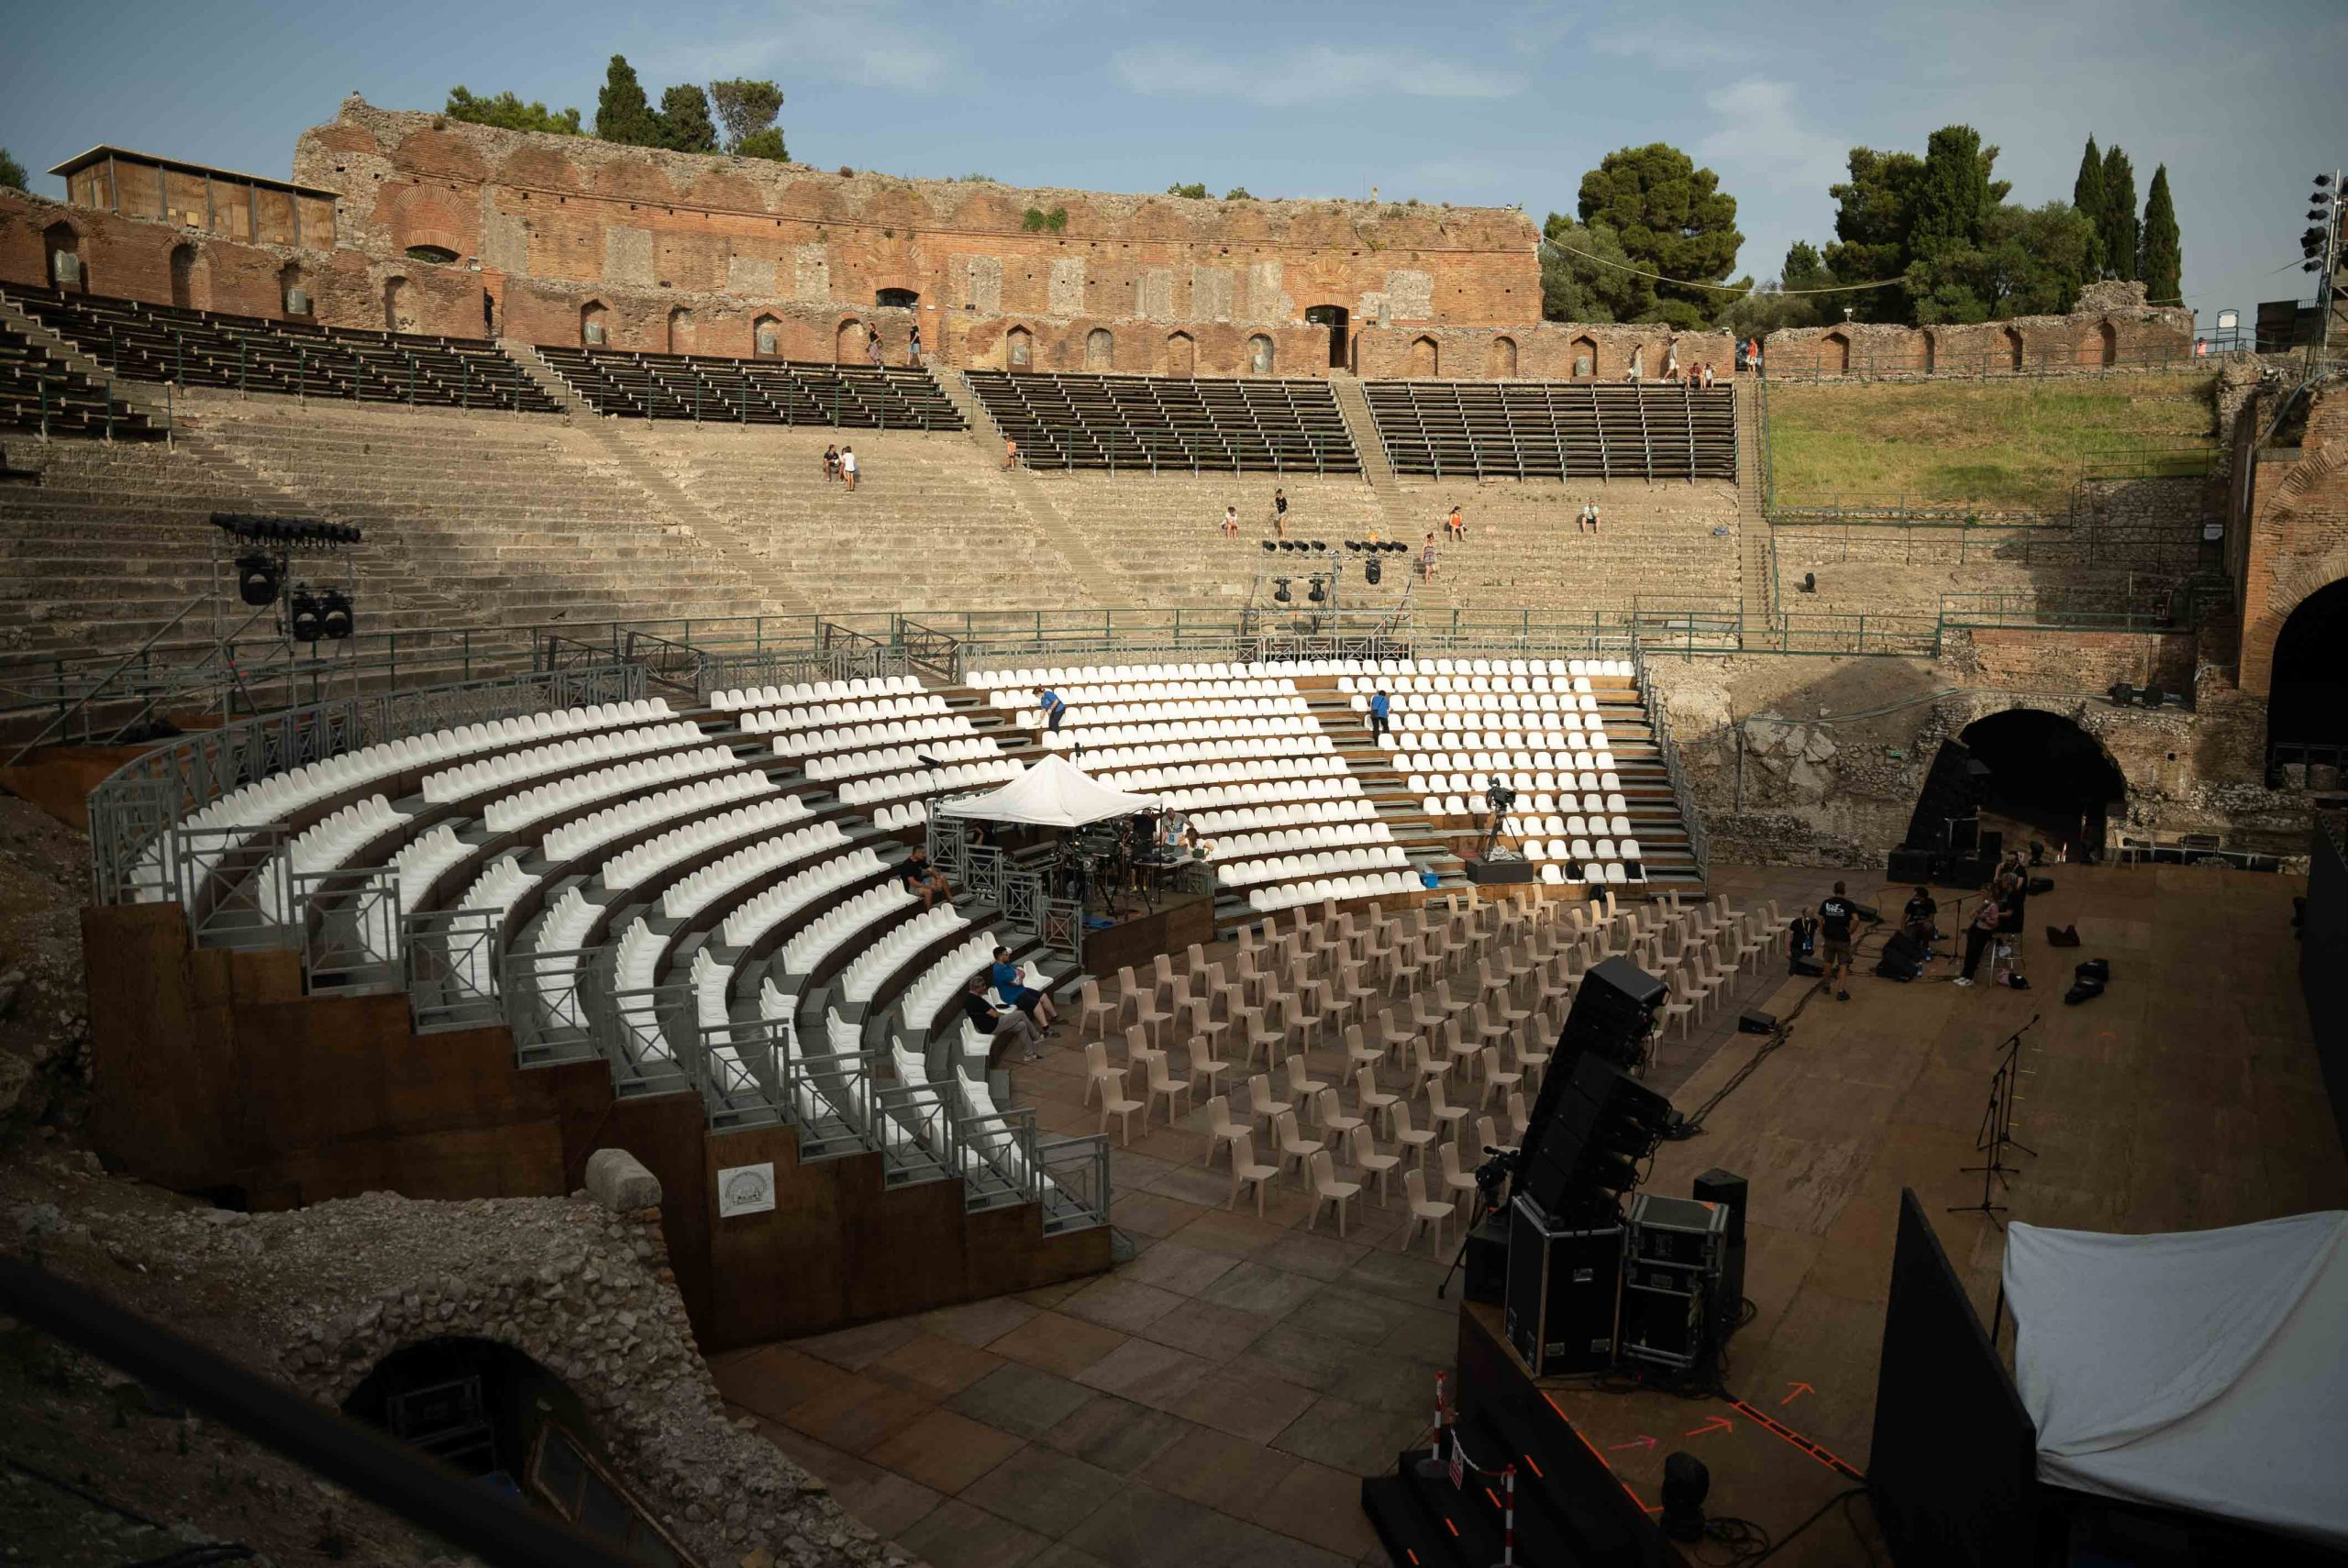 Land_Rover_Tour_Sicilia_2021_Land_Rover_Experience_Italia_-128